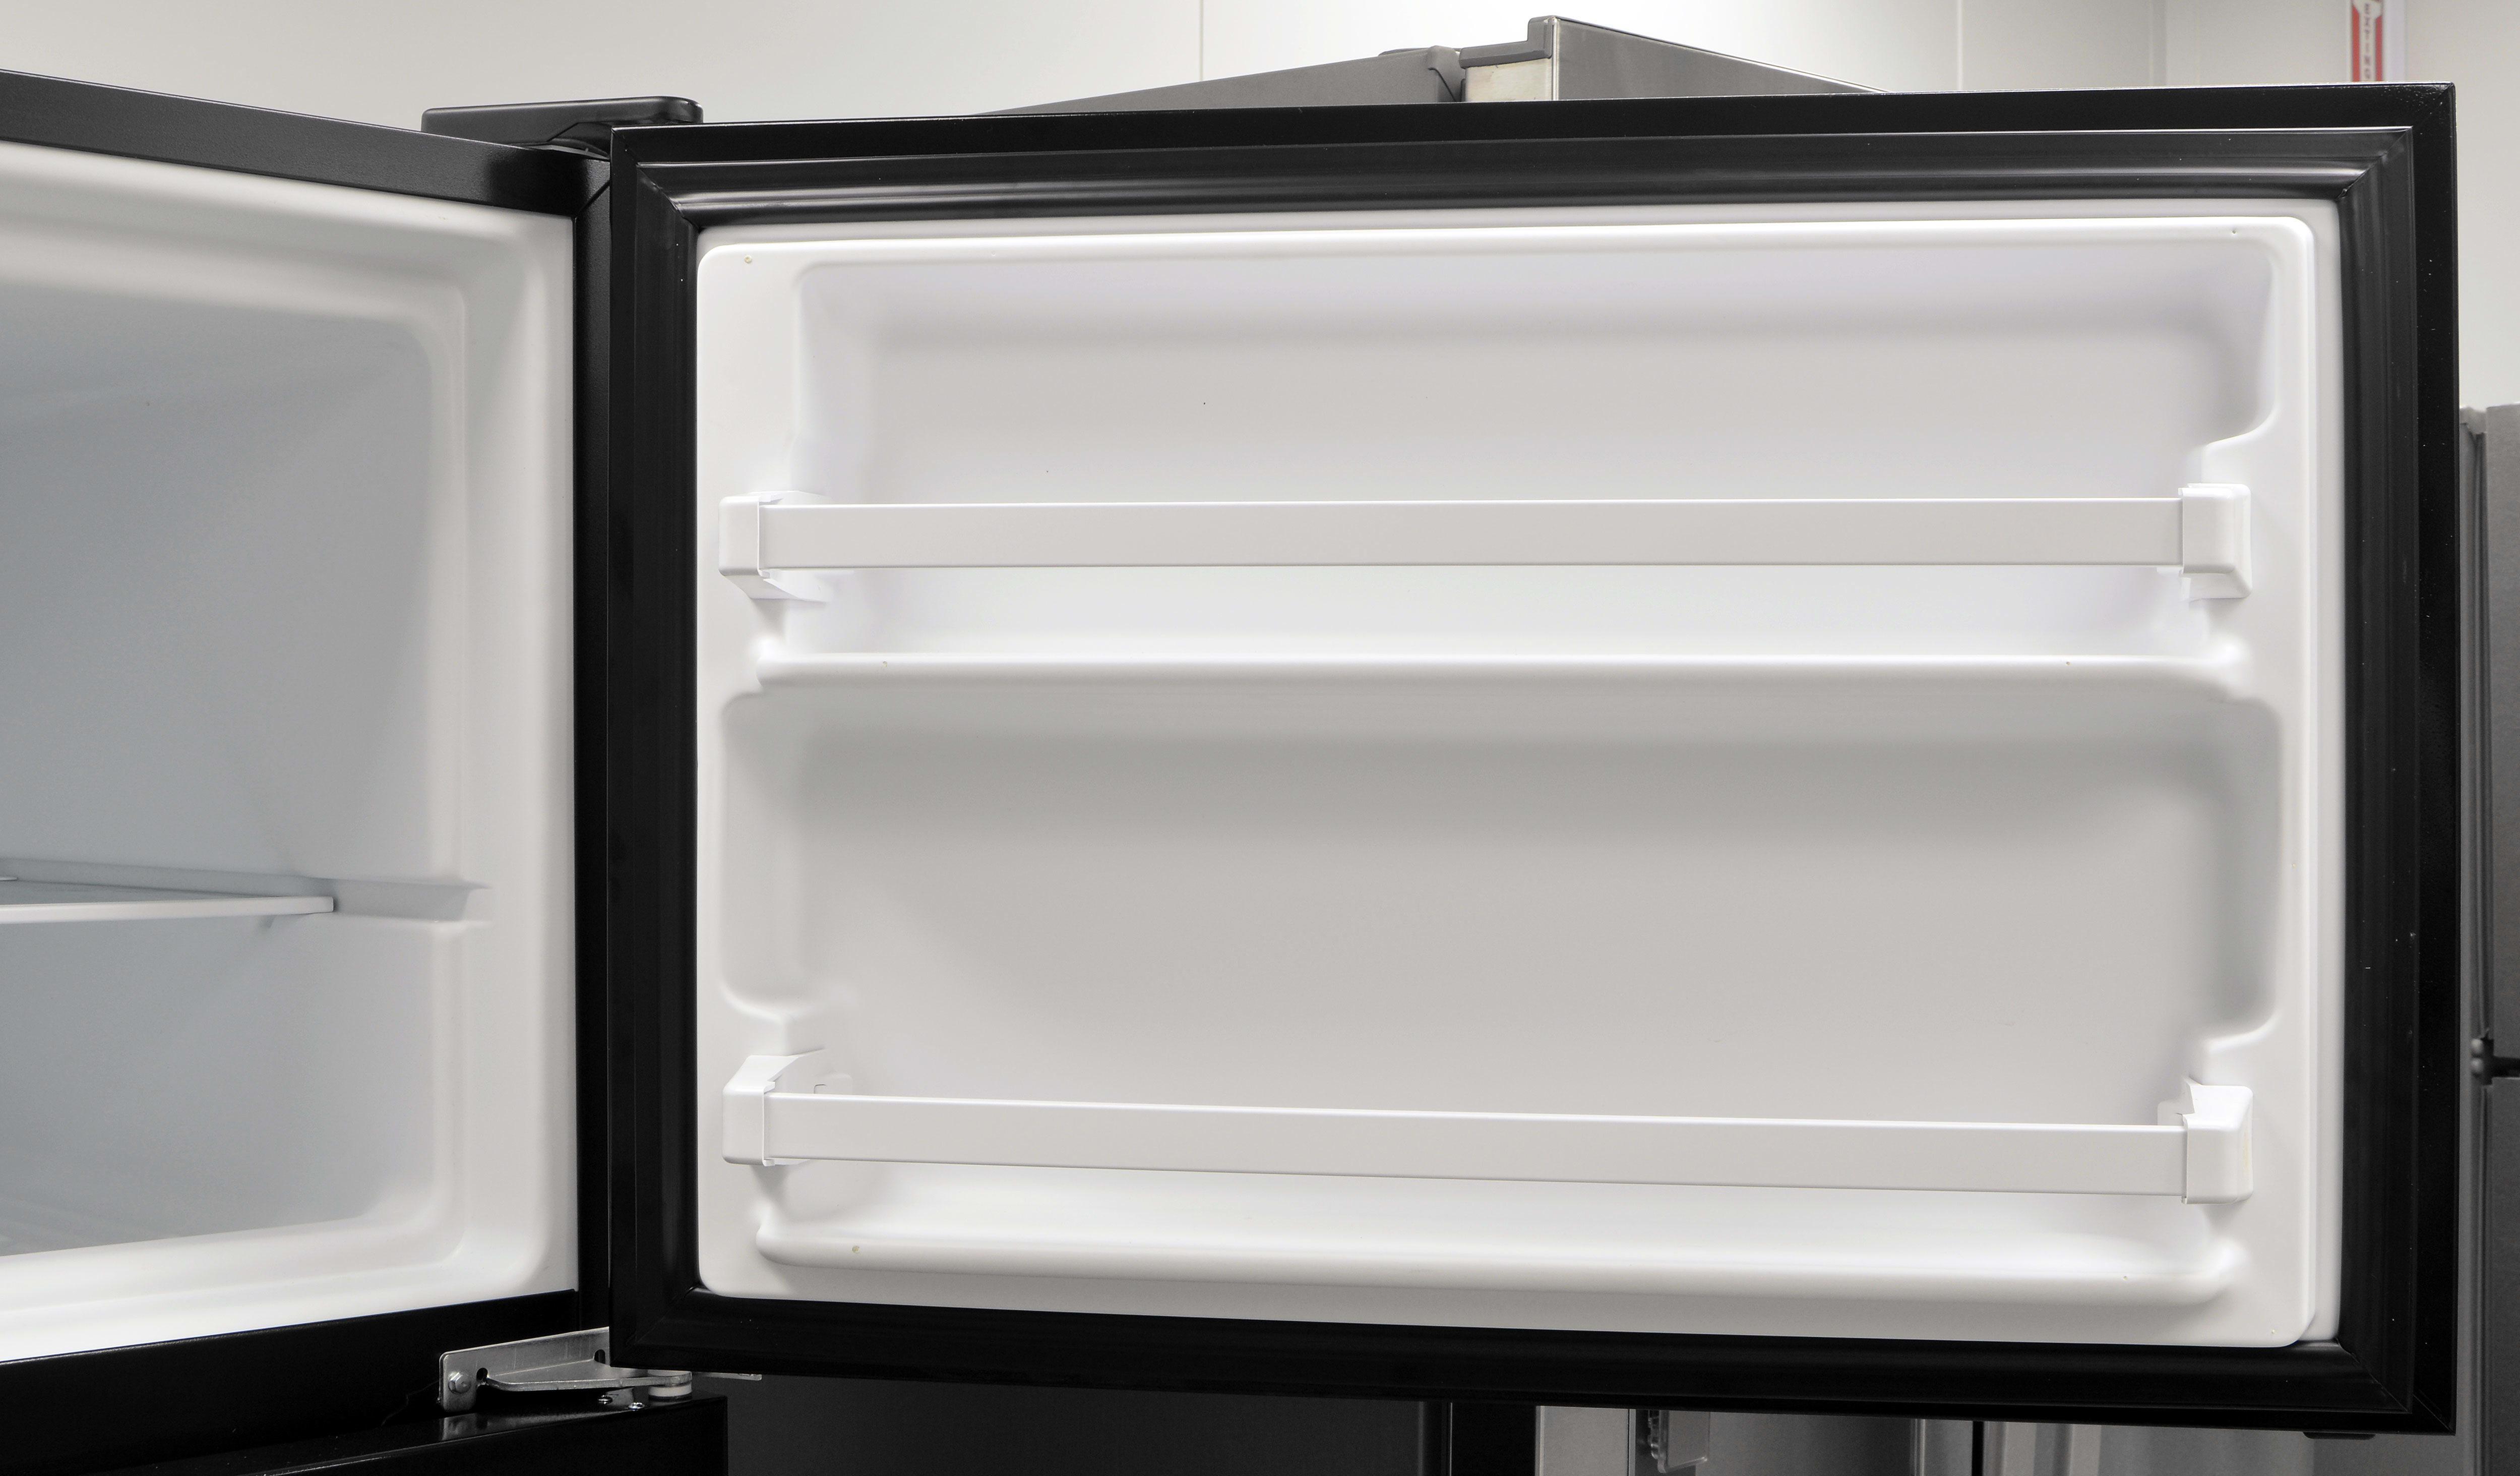 The Whirlpool WRT318FZDB's basic freezer door – seen one, ya seen 'em all.